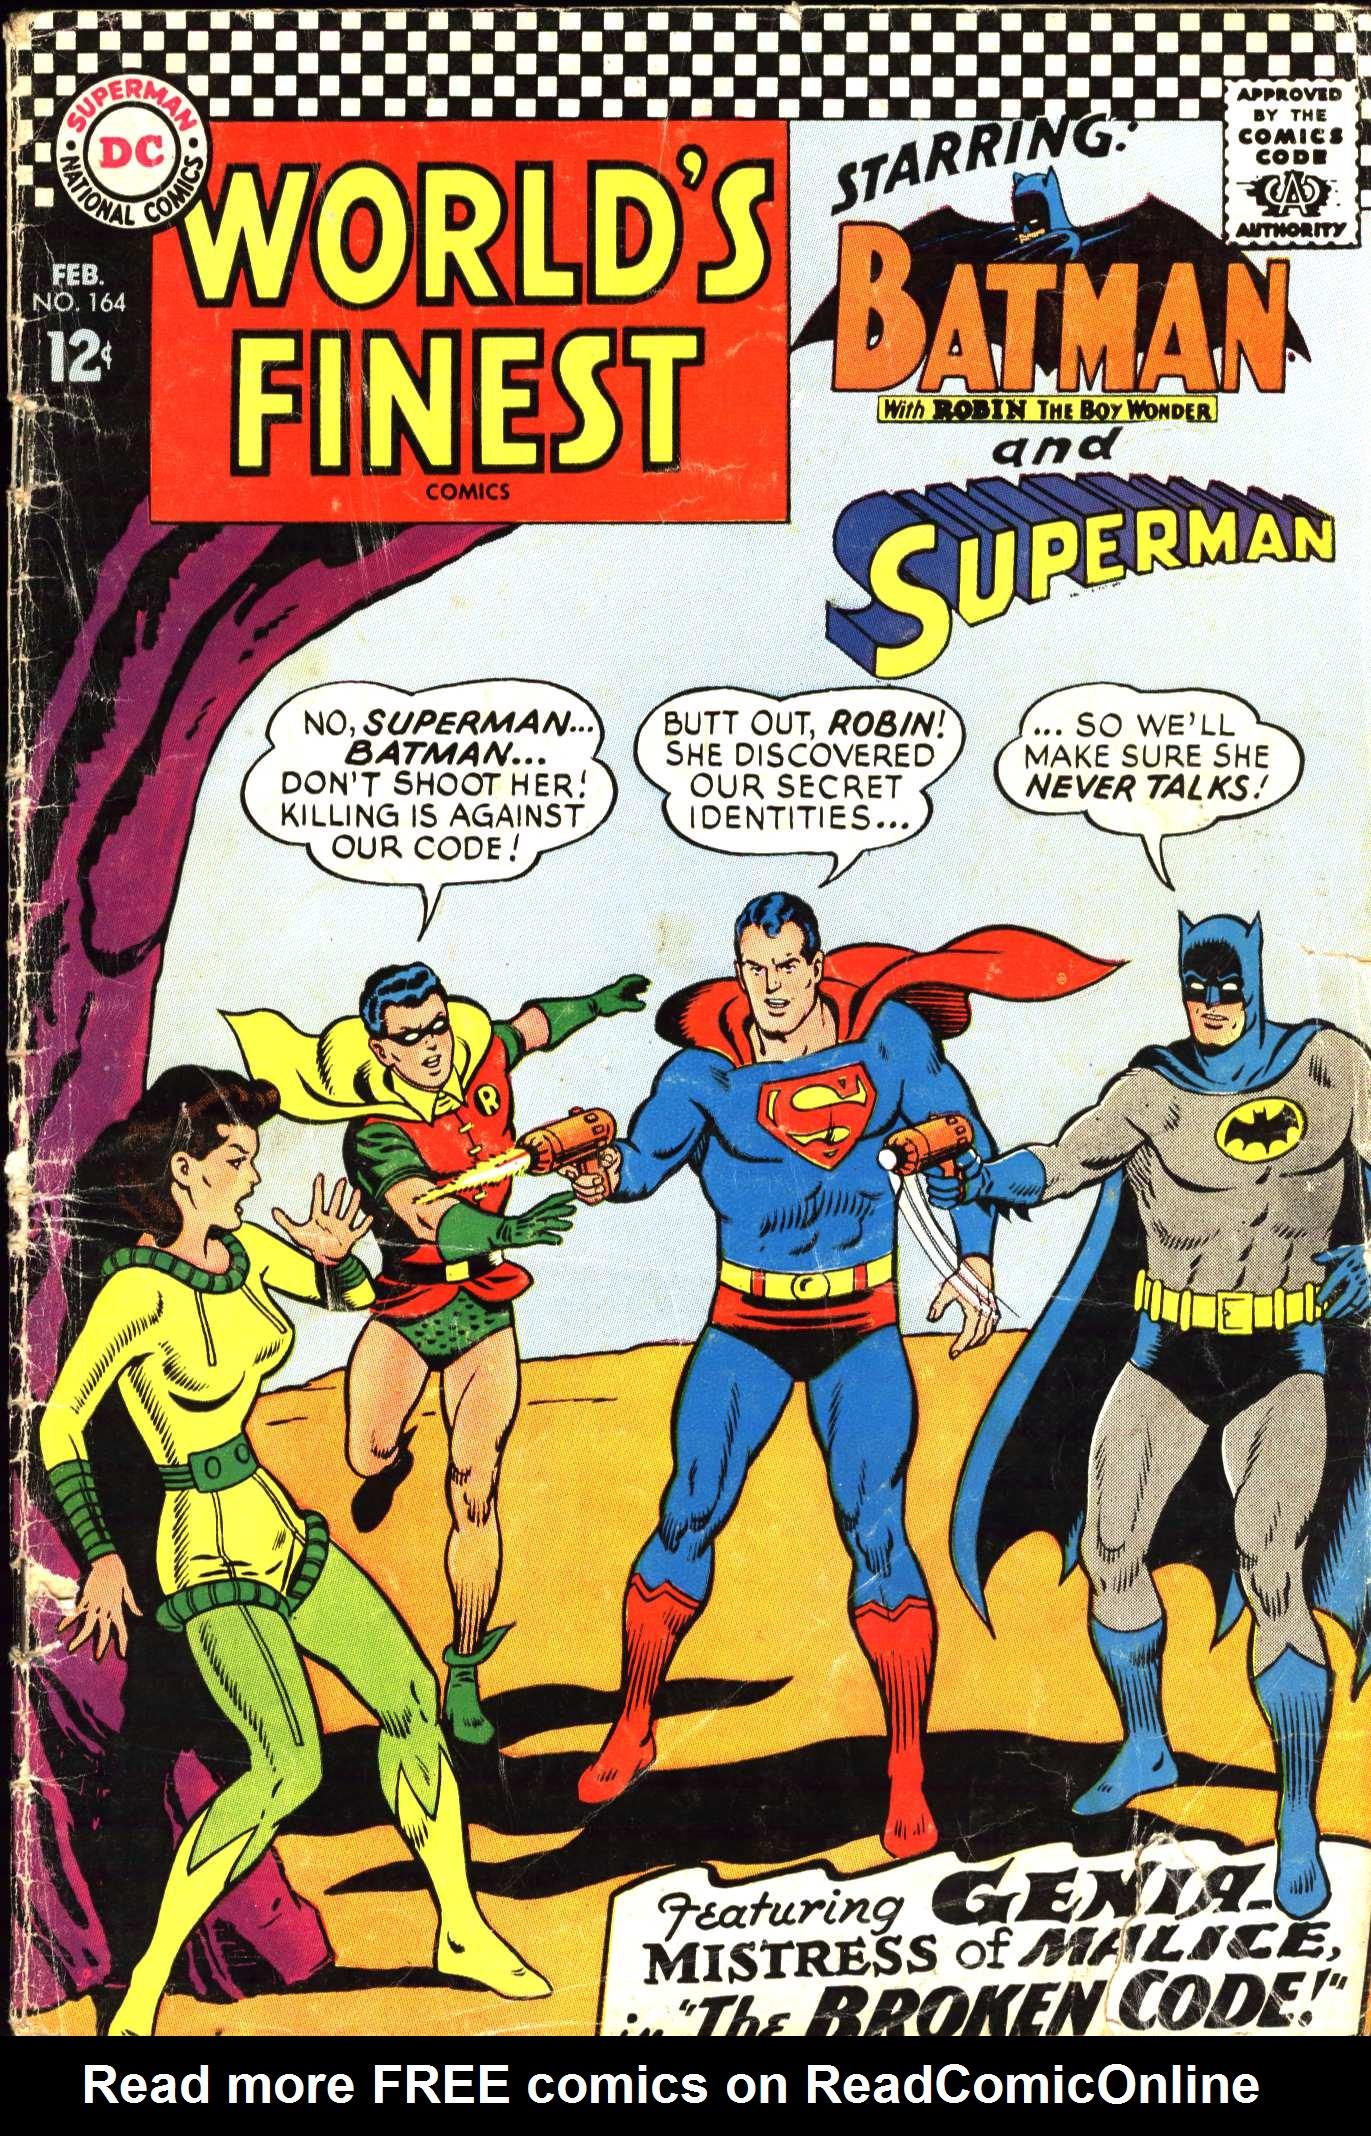 Read online World's Finest Comics comic -  Issue #164 - 1